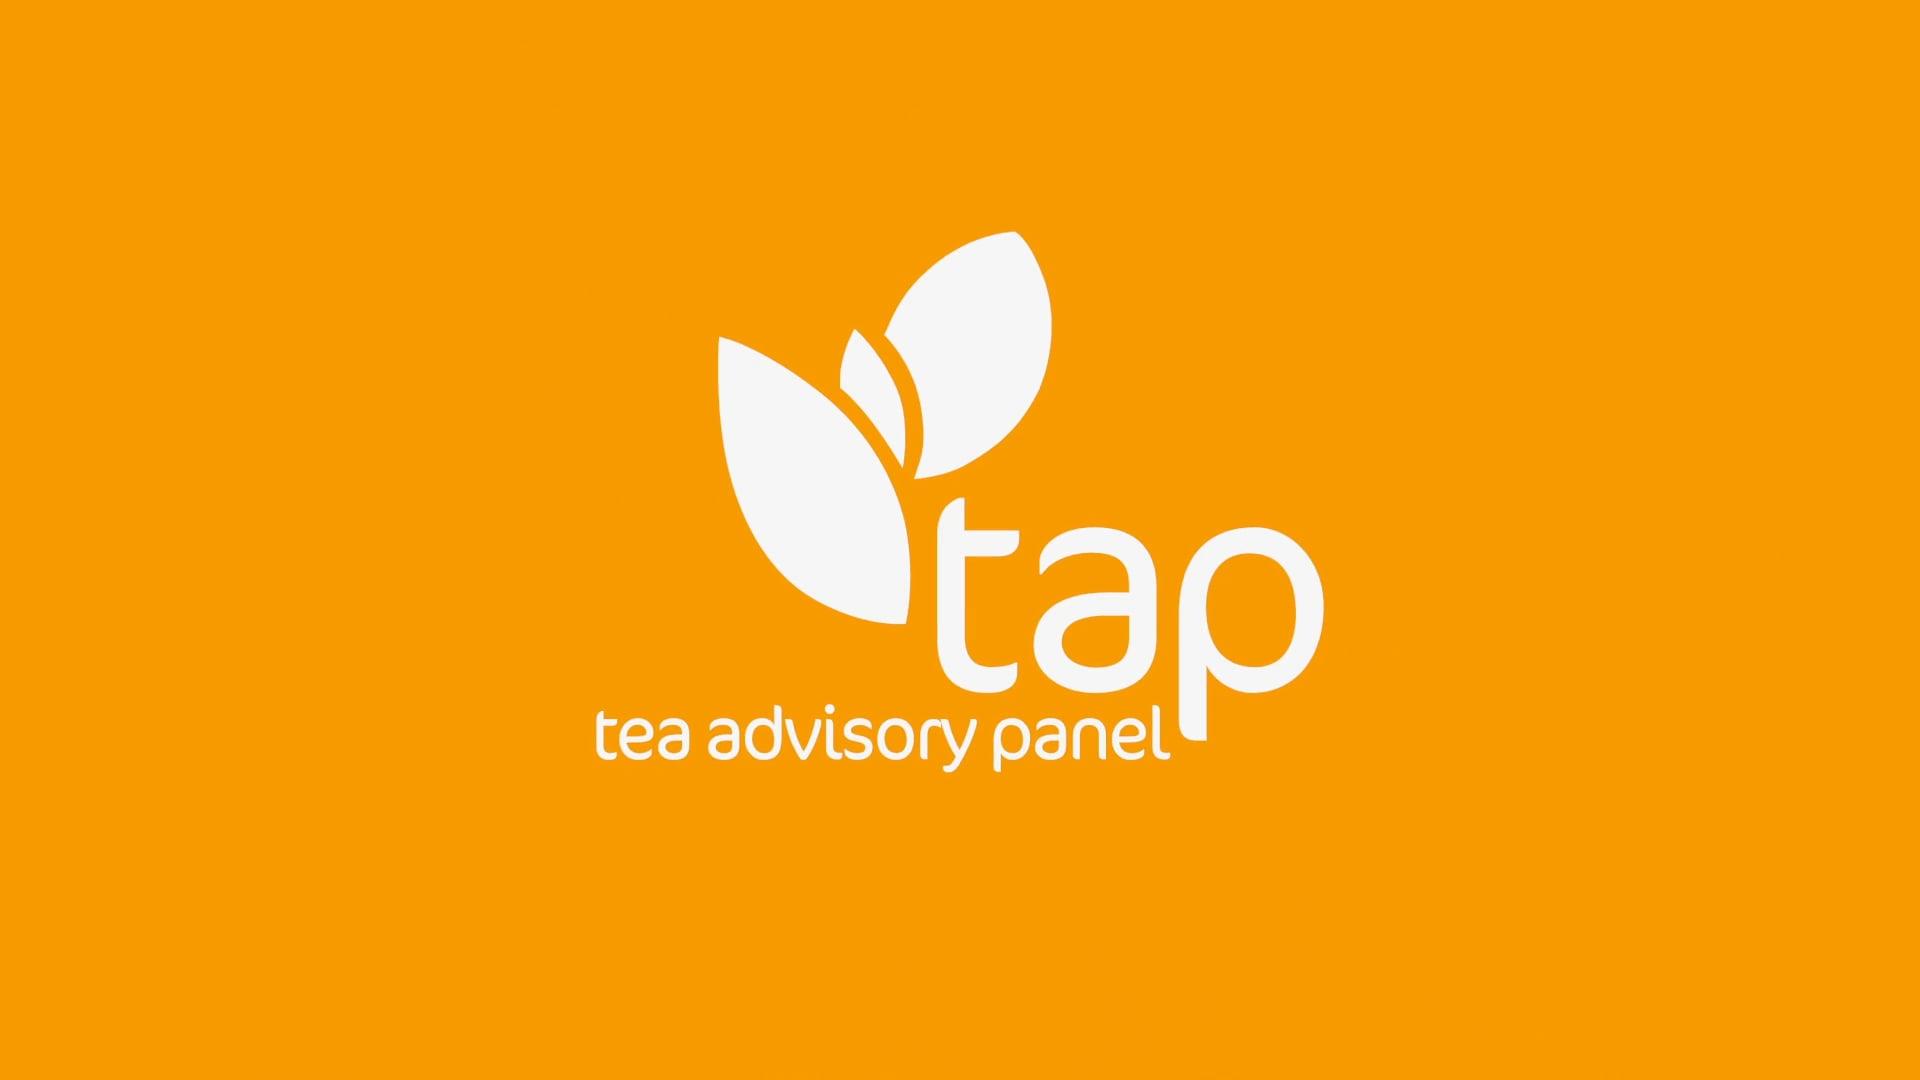 Tea Advisory Panel